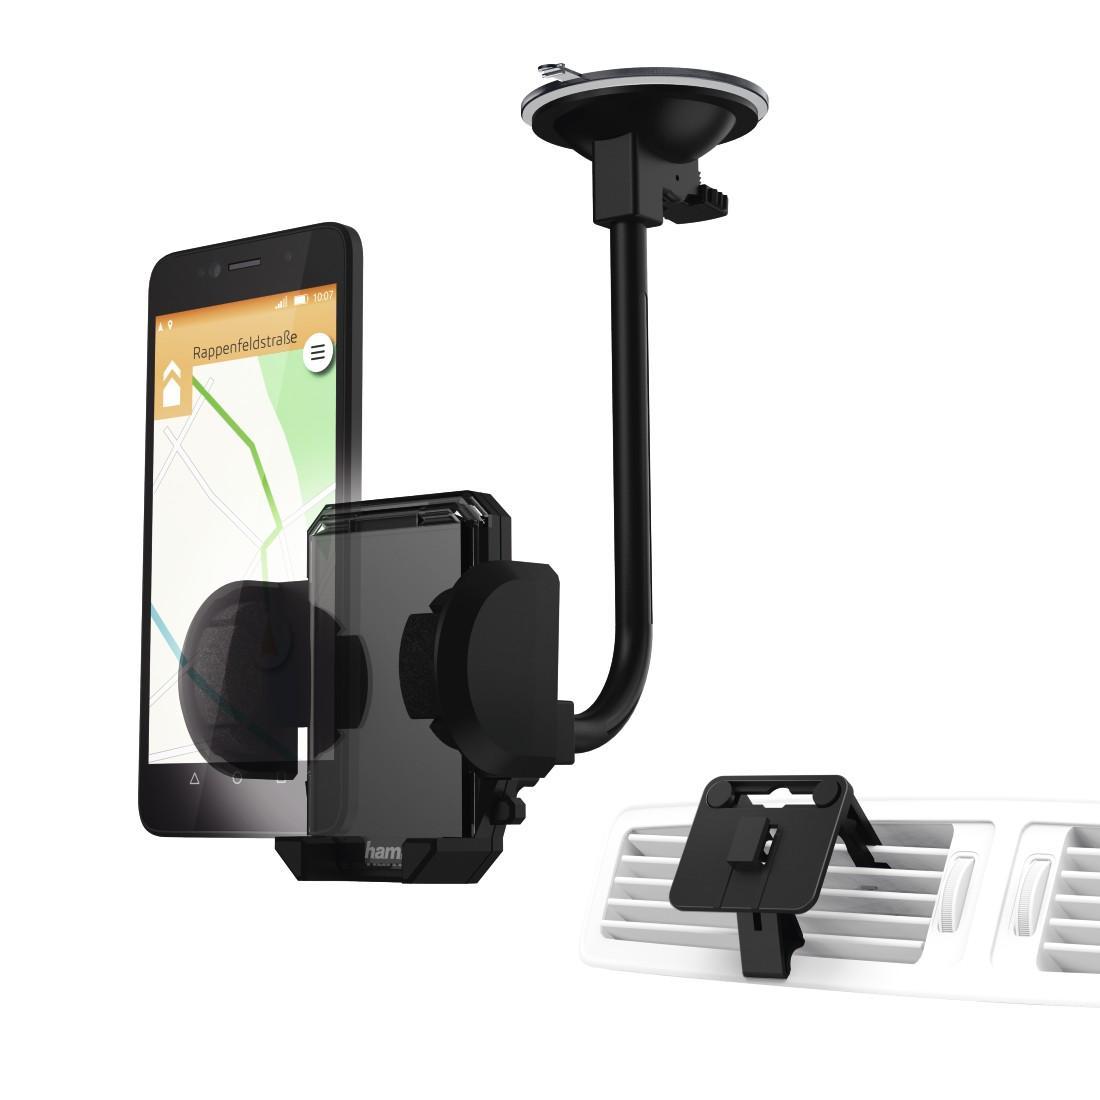 Универсална поставка/комплект/ за навигации/телефон/таблет за стъкло и кола HAMA 173880, размер 4 - 11 см, Черен